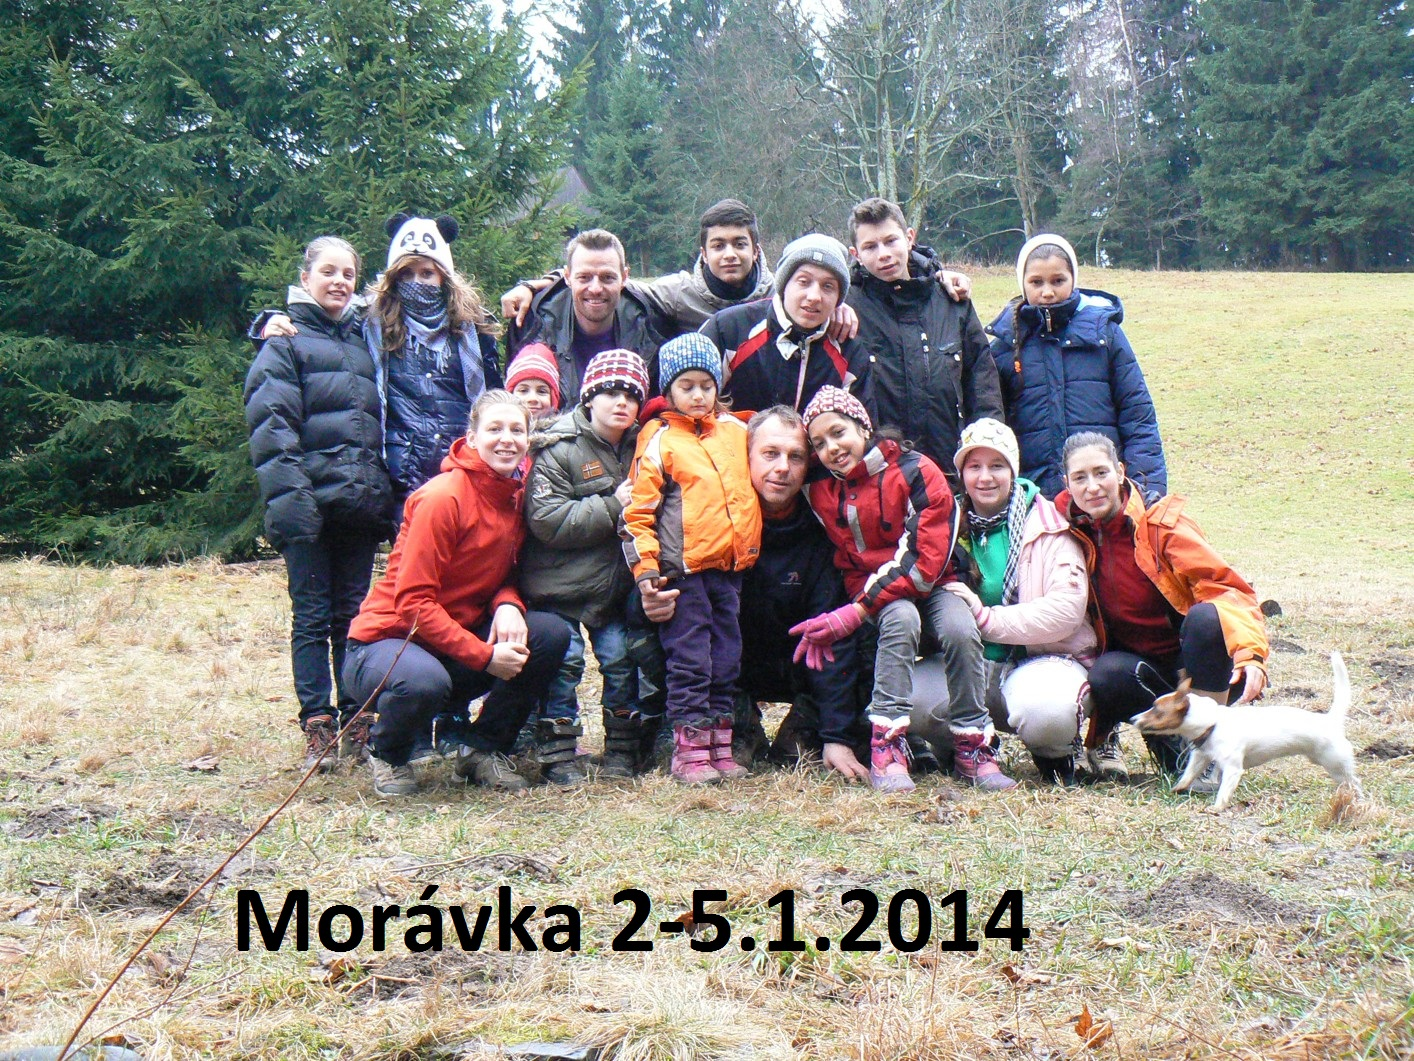 Moravka_2-5.1.2014